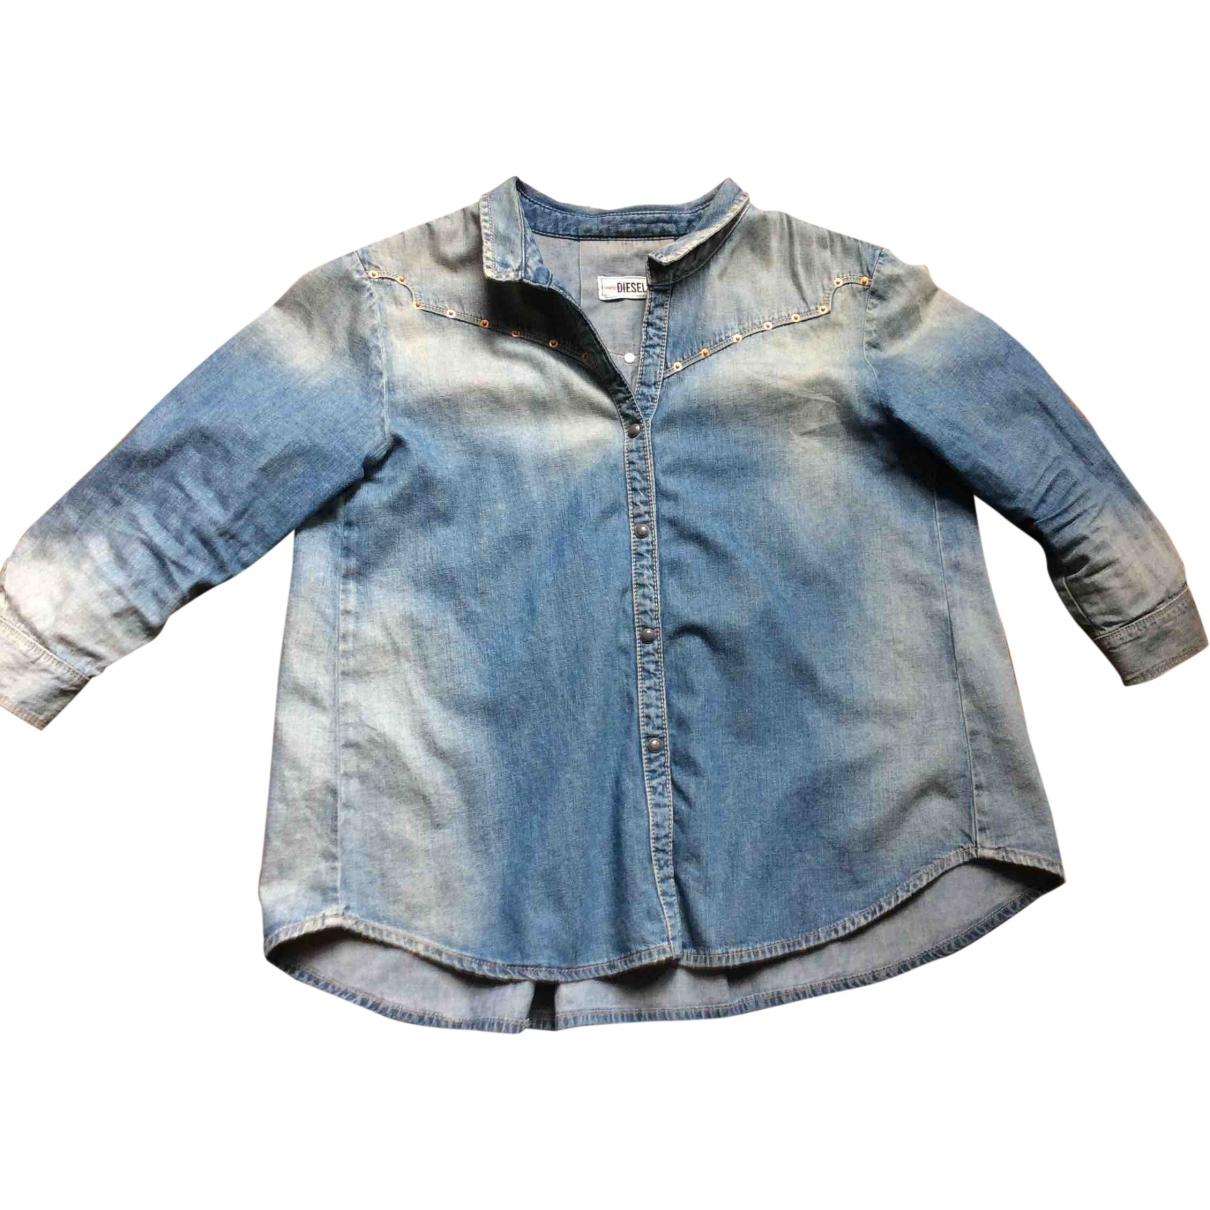 Diesel \N Blue Denim - Jeans  top for Women S International